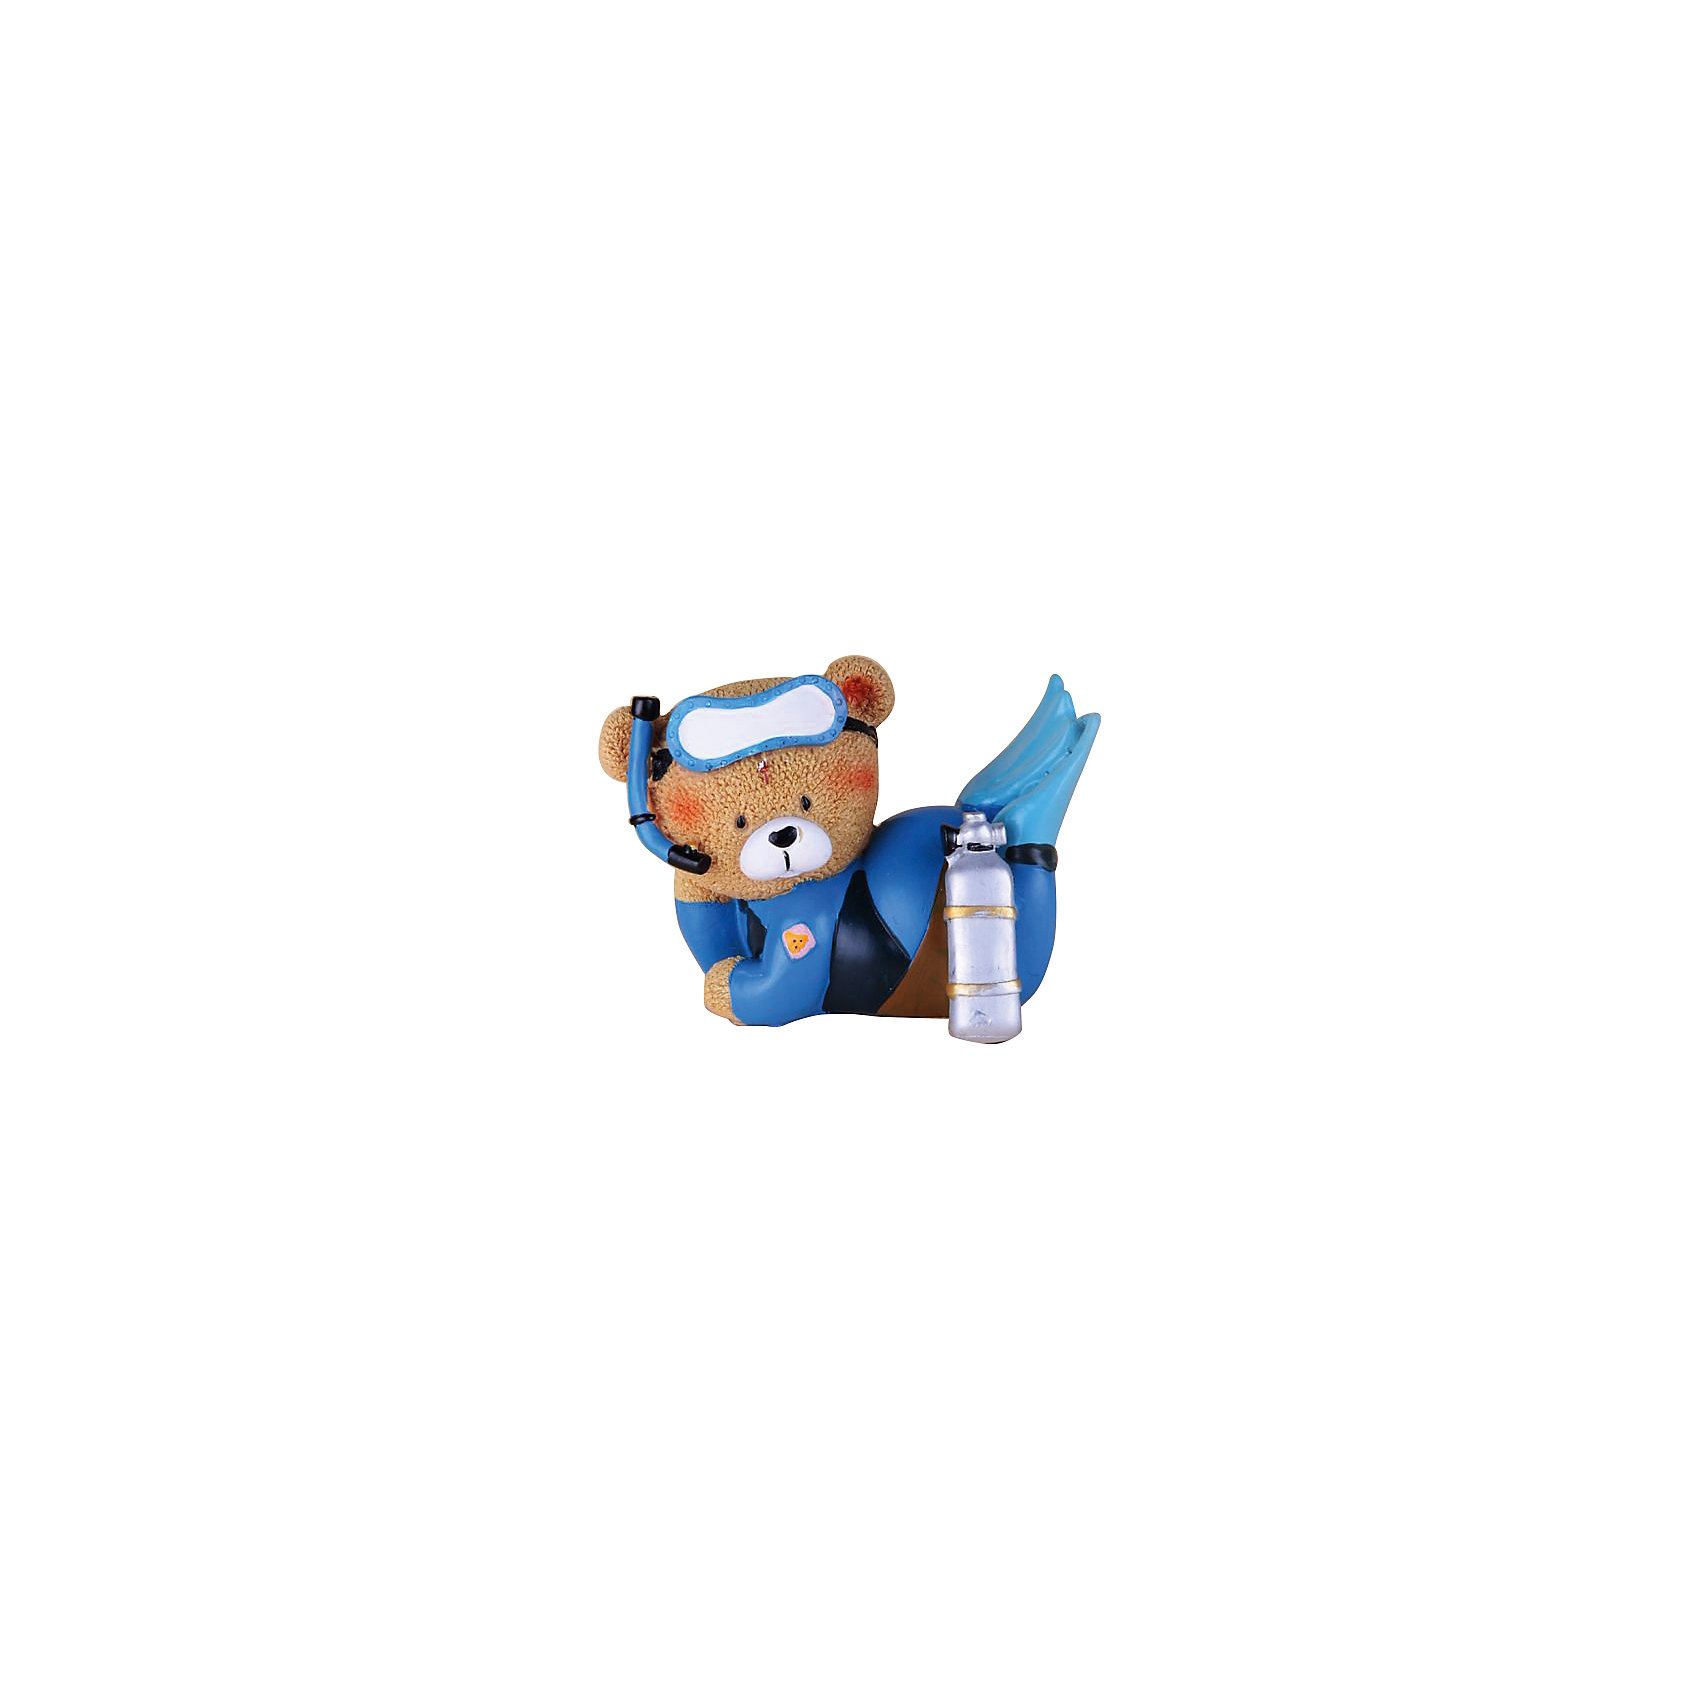 Феникс-Презент Декоративная фигурка Мишка-аквалангист декоративная фигурка феникс презент африканка с дочерьми высота 38 5 см